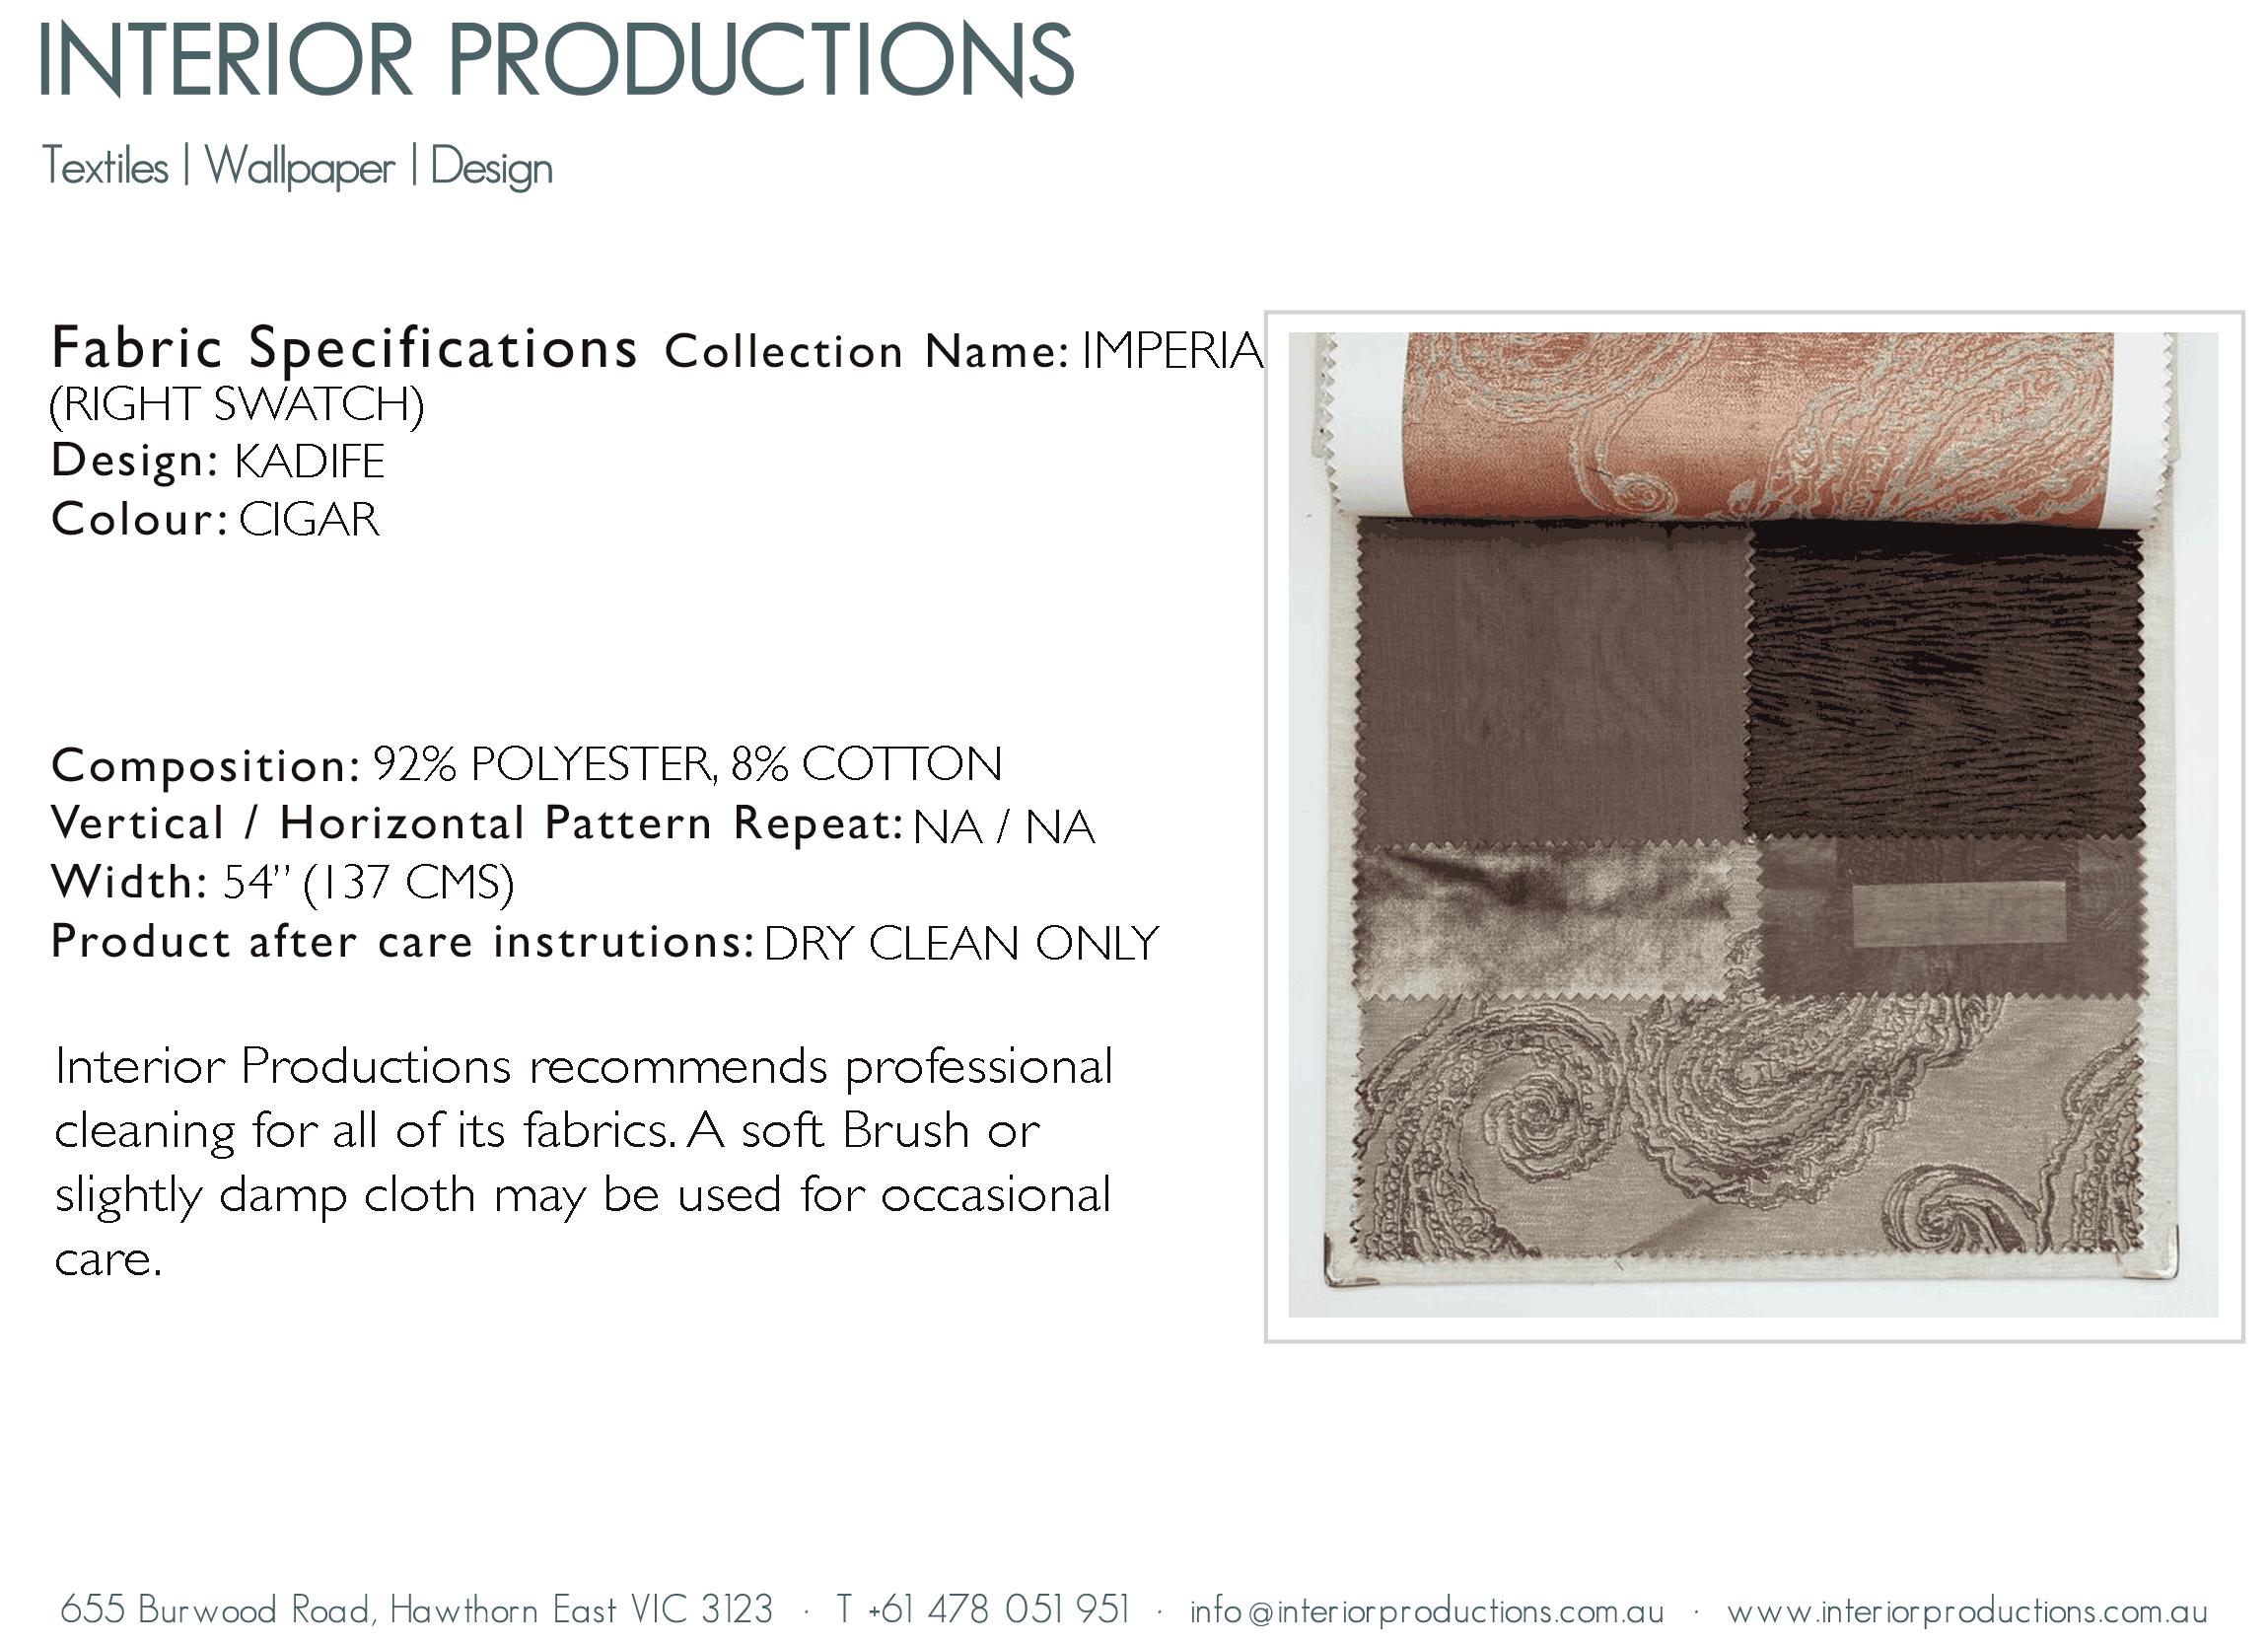 interior_productions_KADIFE---CIGAR